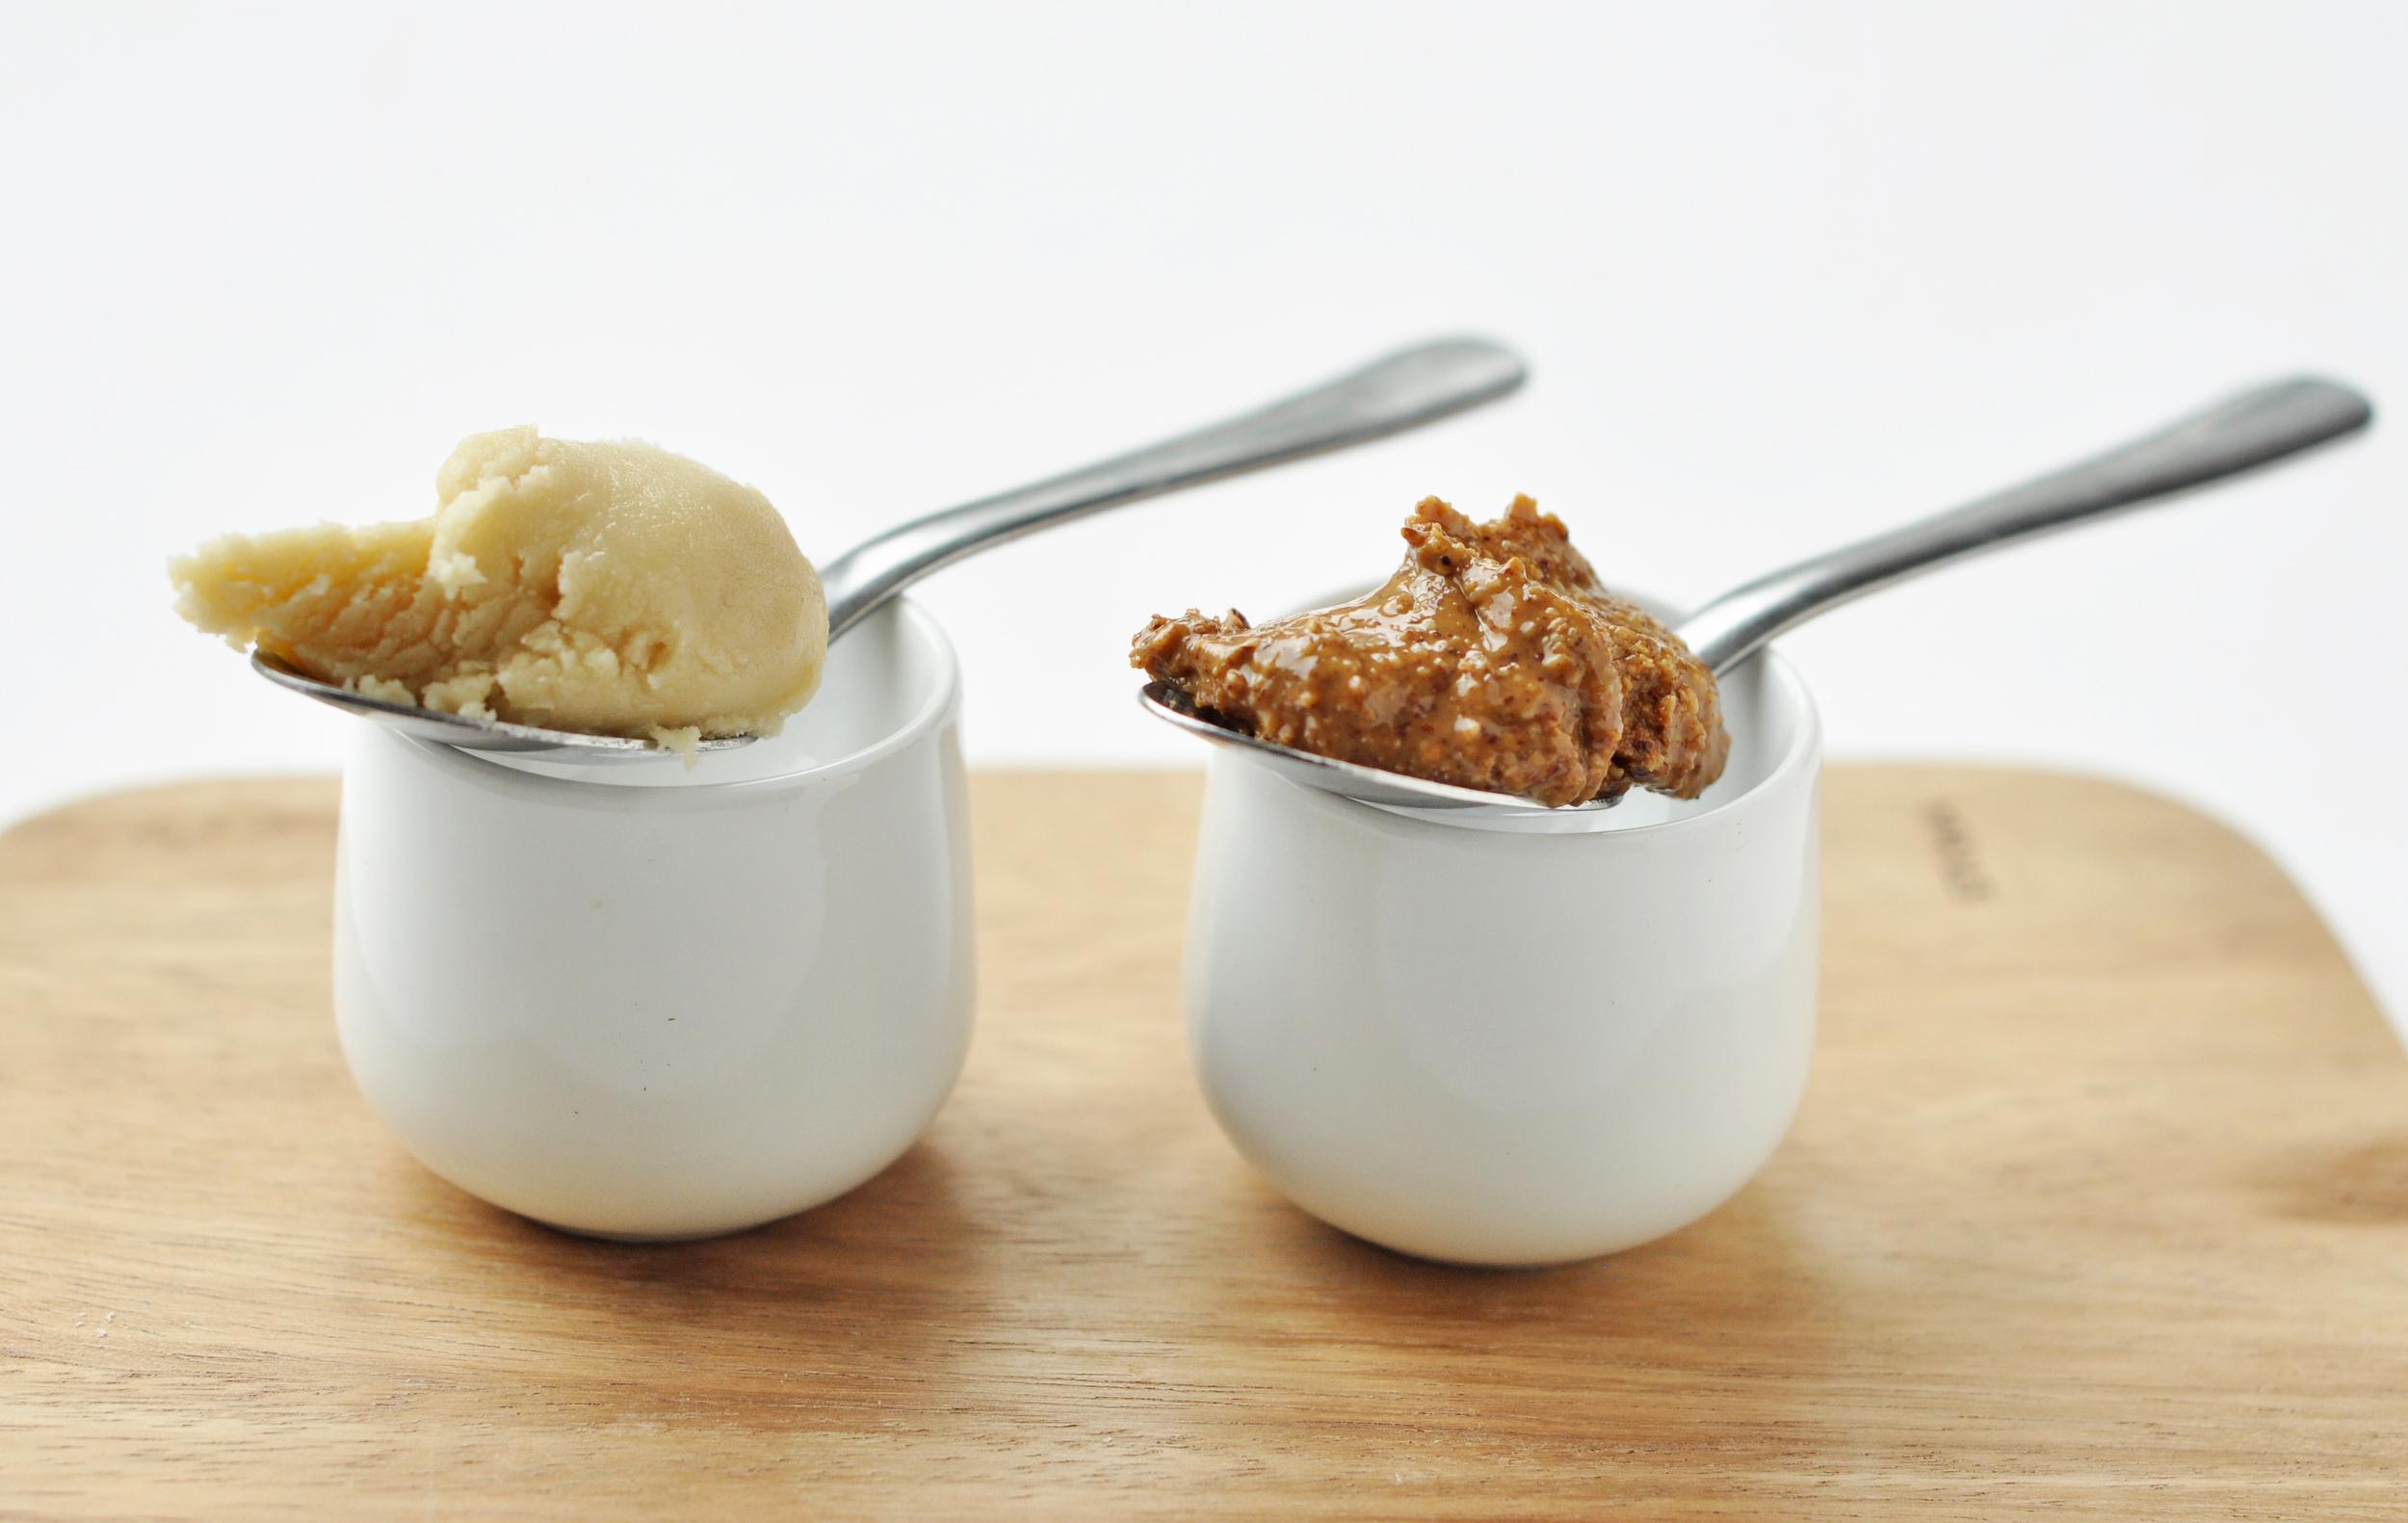 almond paste vs almond butter